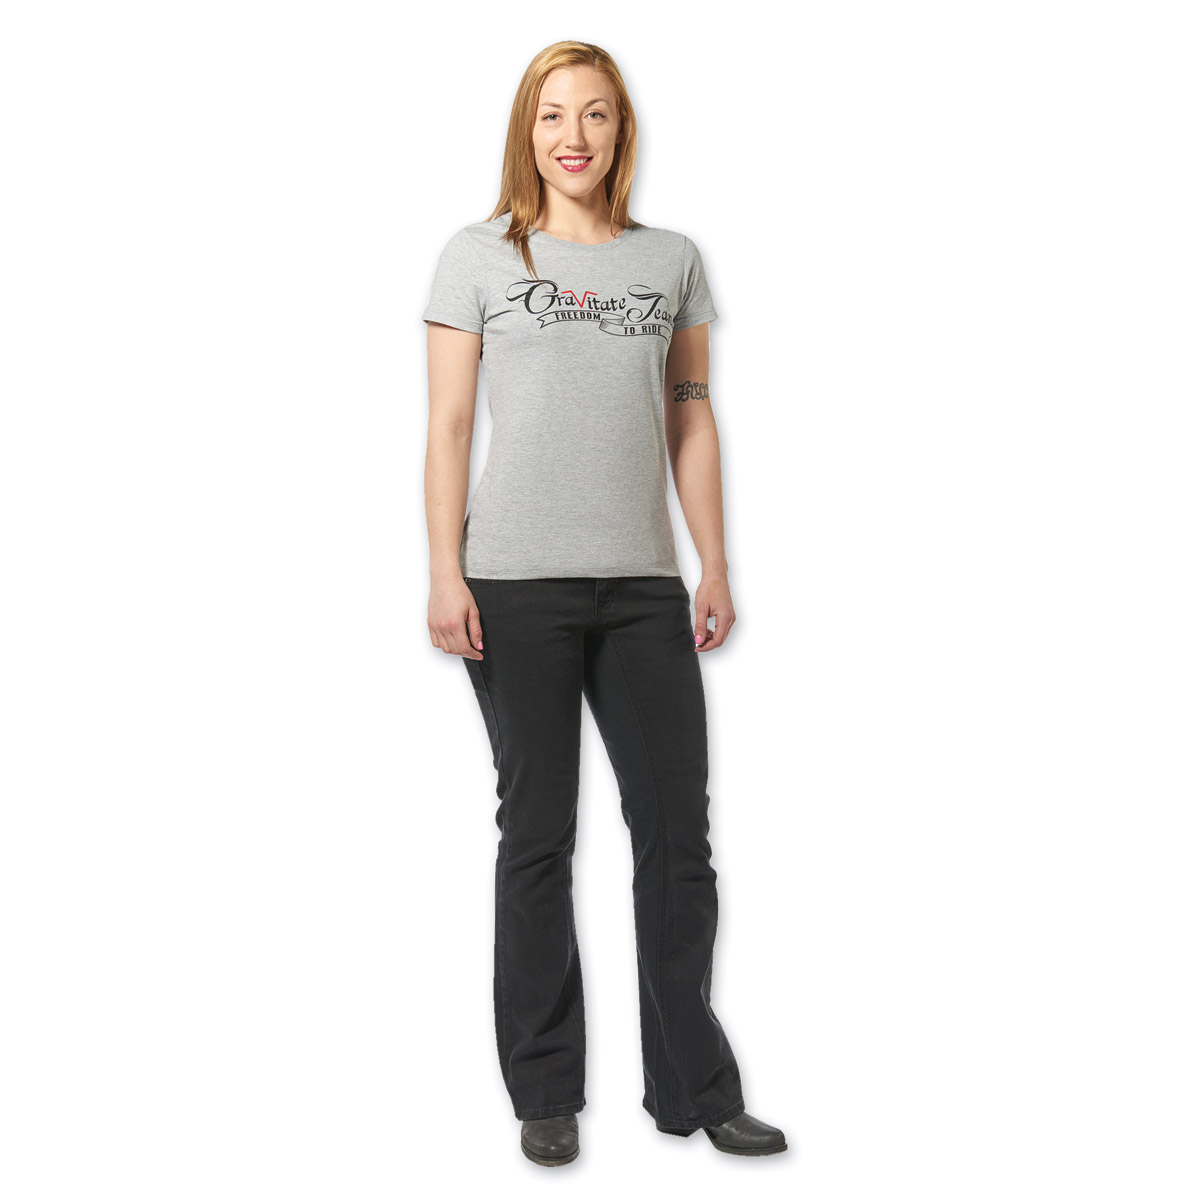 Gravitate Women's Black Motorcycle Jeans